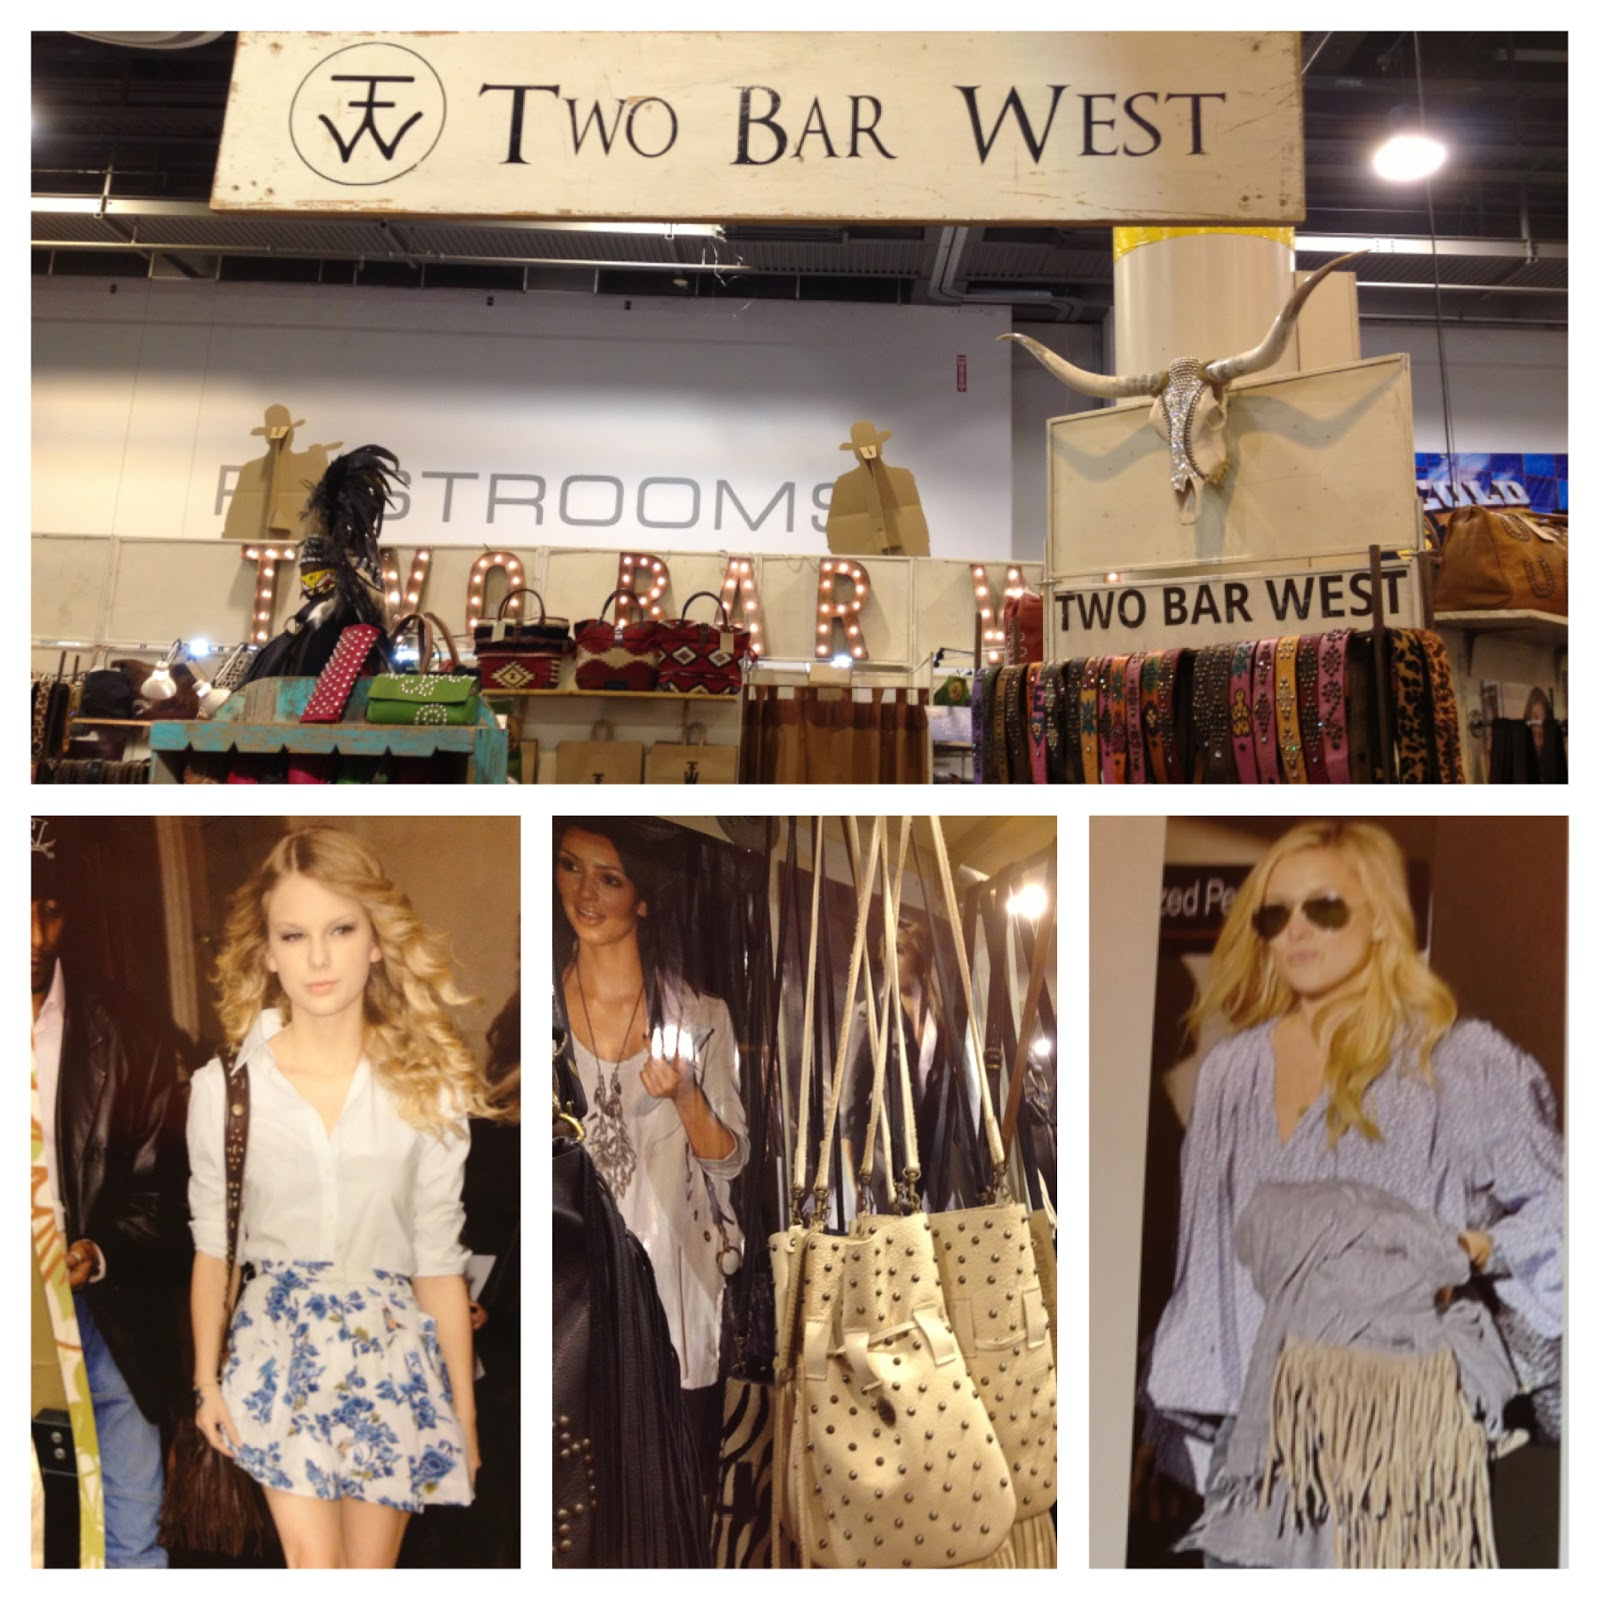 Two Bar West Booth At Hlsr 2017 Taylor Swift Kim Kardashian Kate Hudson